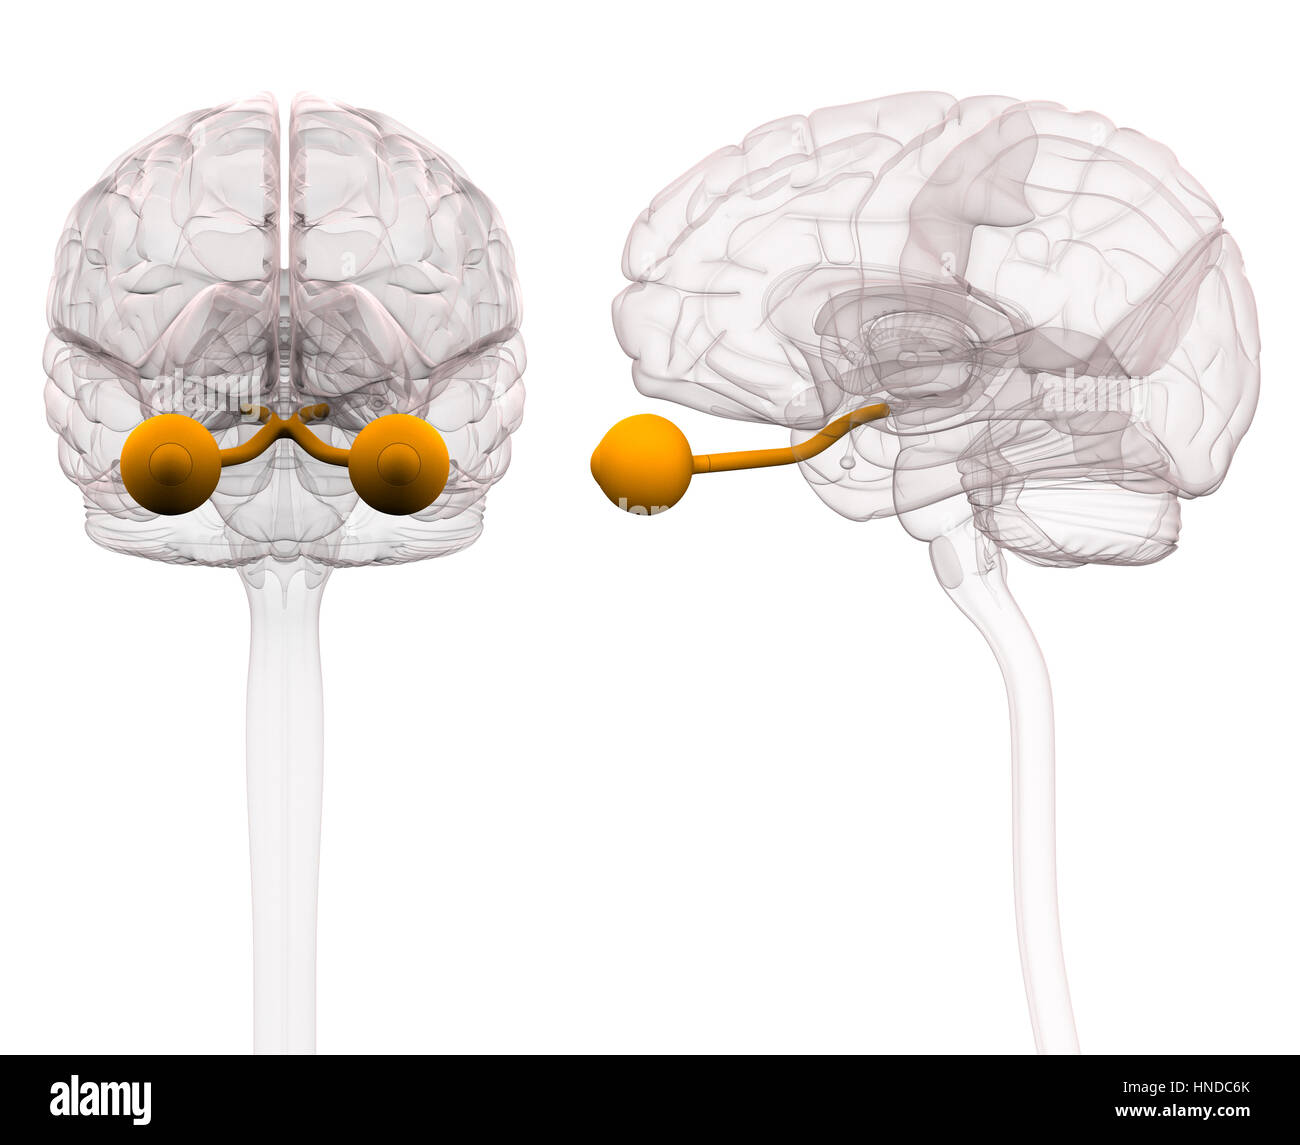 Optical Nerve Brain Anatomy - 3d illustration - Stock Image